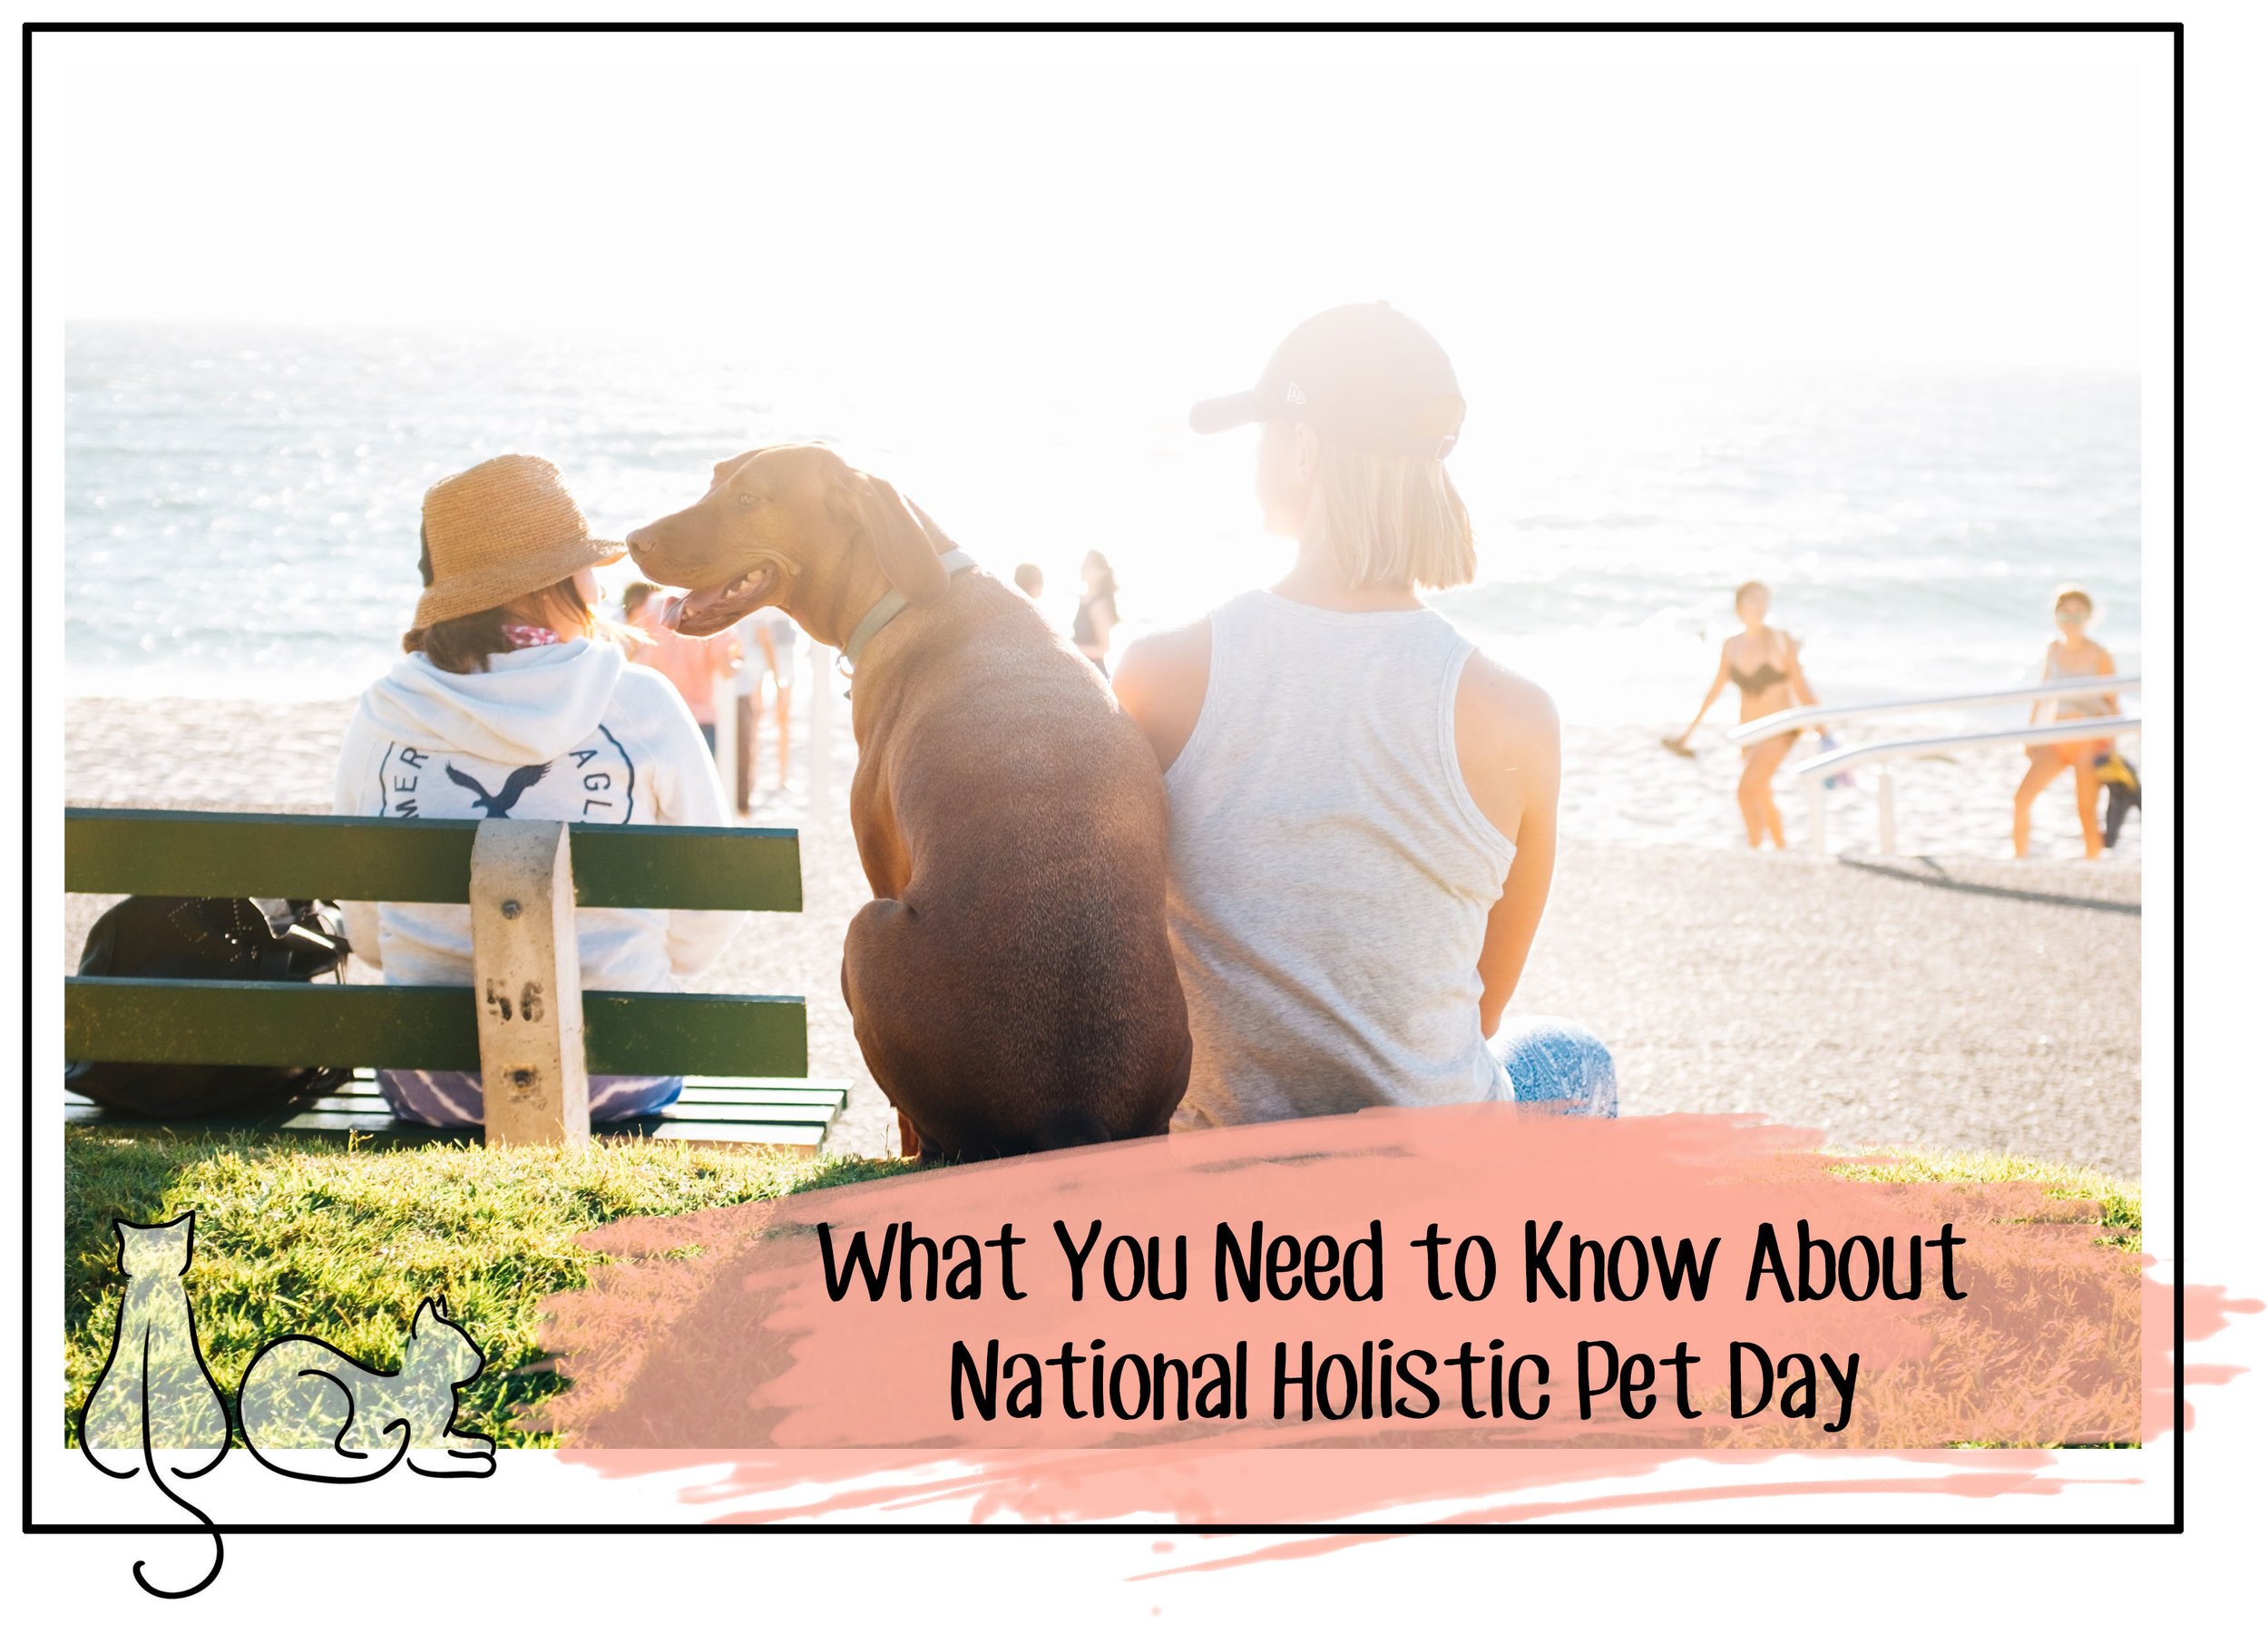 national holistic pet day.jpg